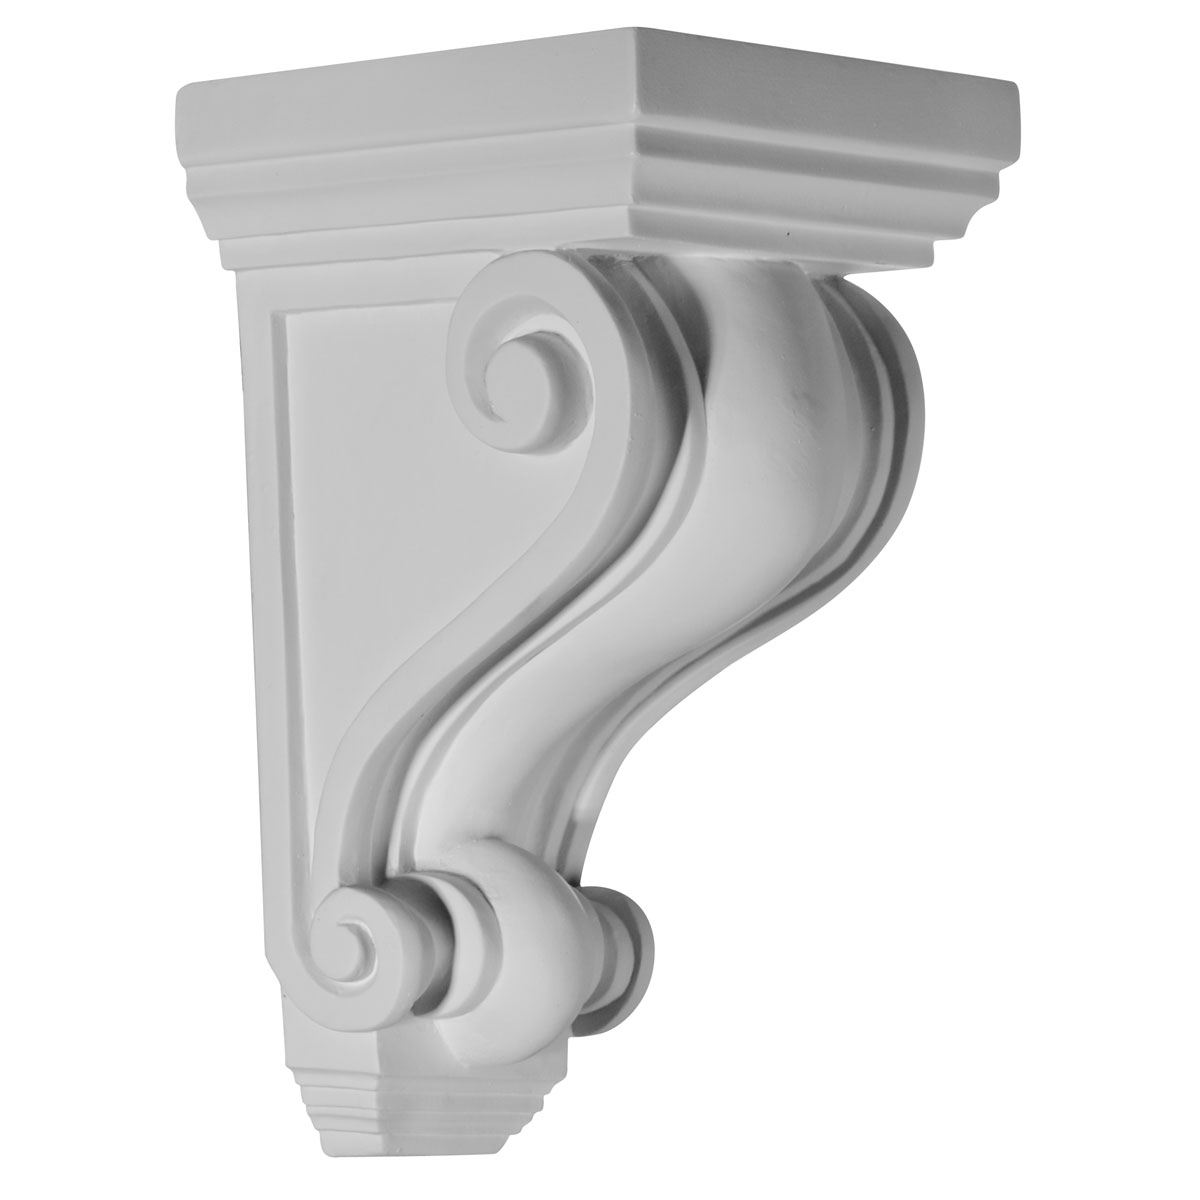 Decorative Corbel 26% off cor02x02x04de | devon corbel | ekena millwork